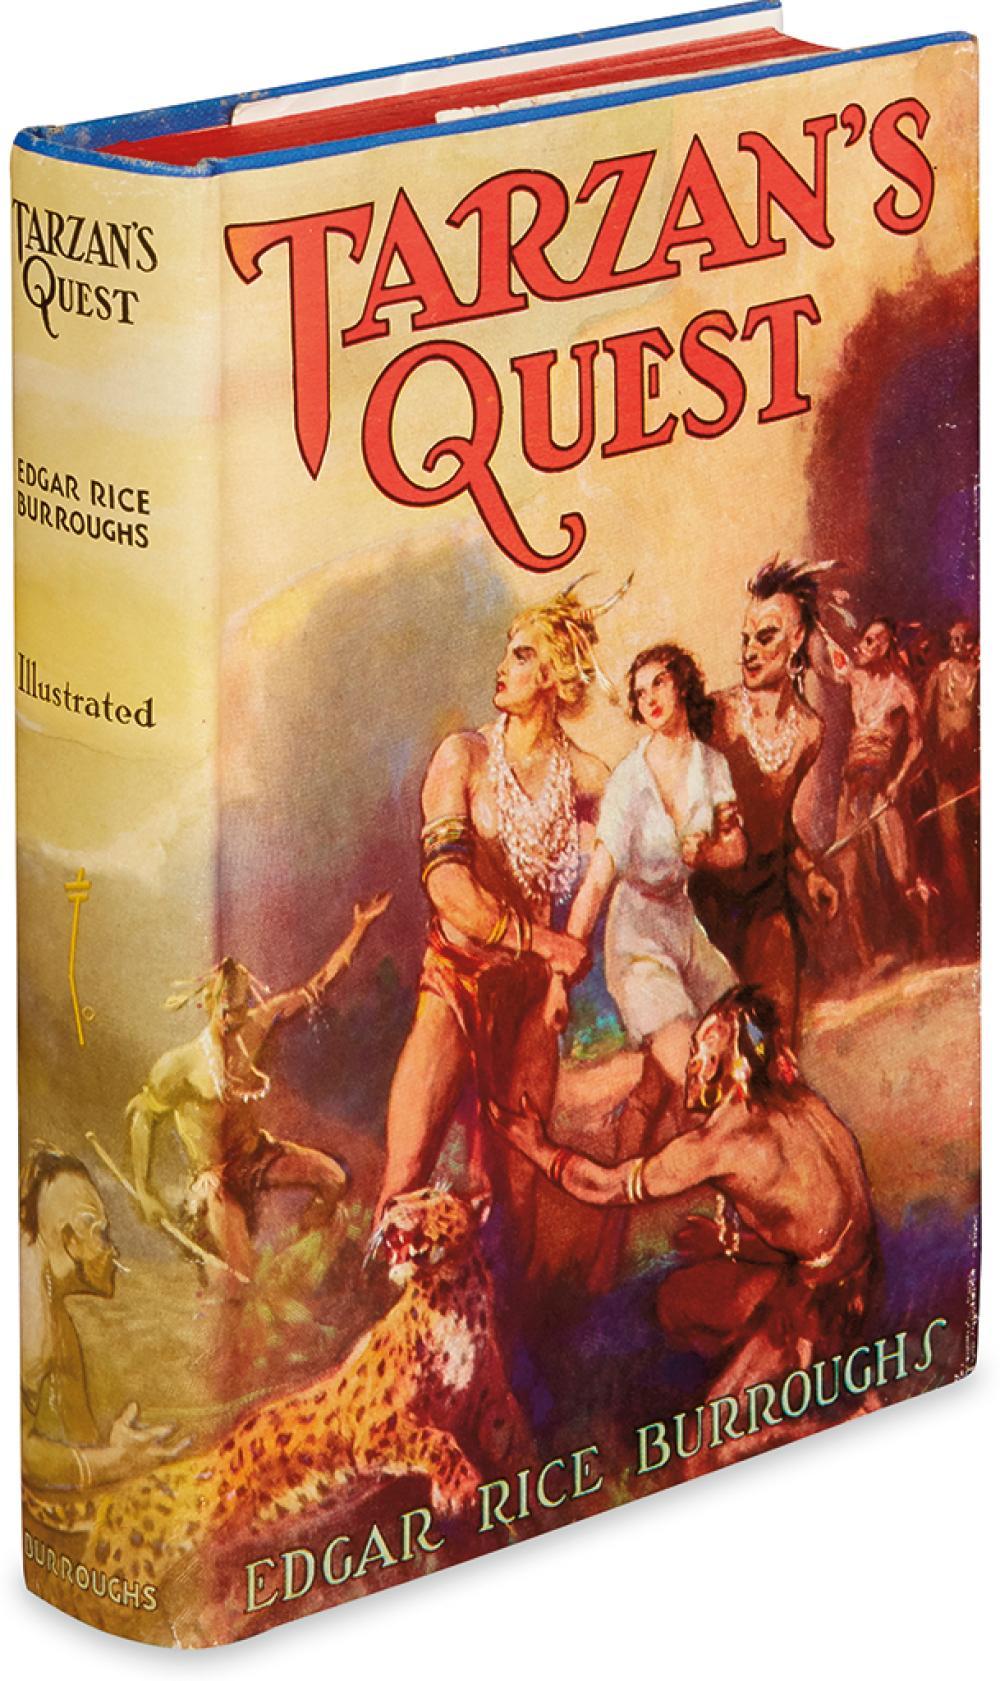 BURROUGHS, EDGAR RICE. Tarzan's Quest.